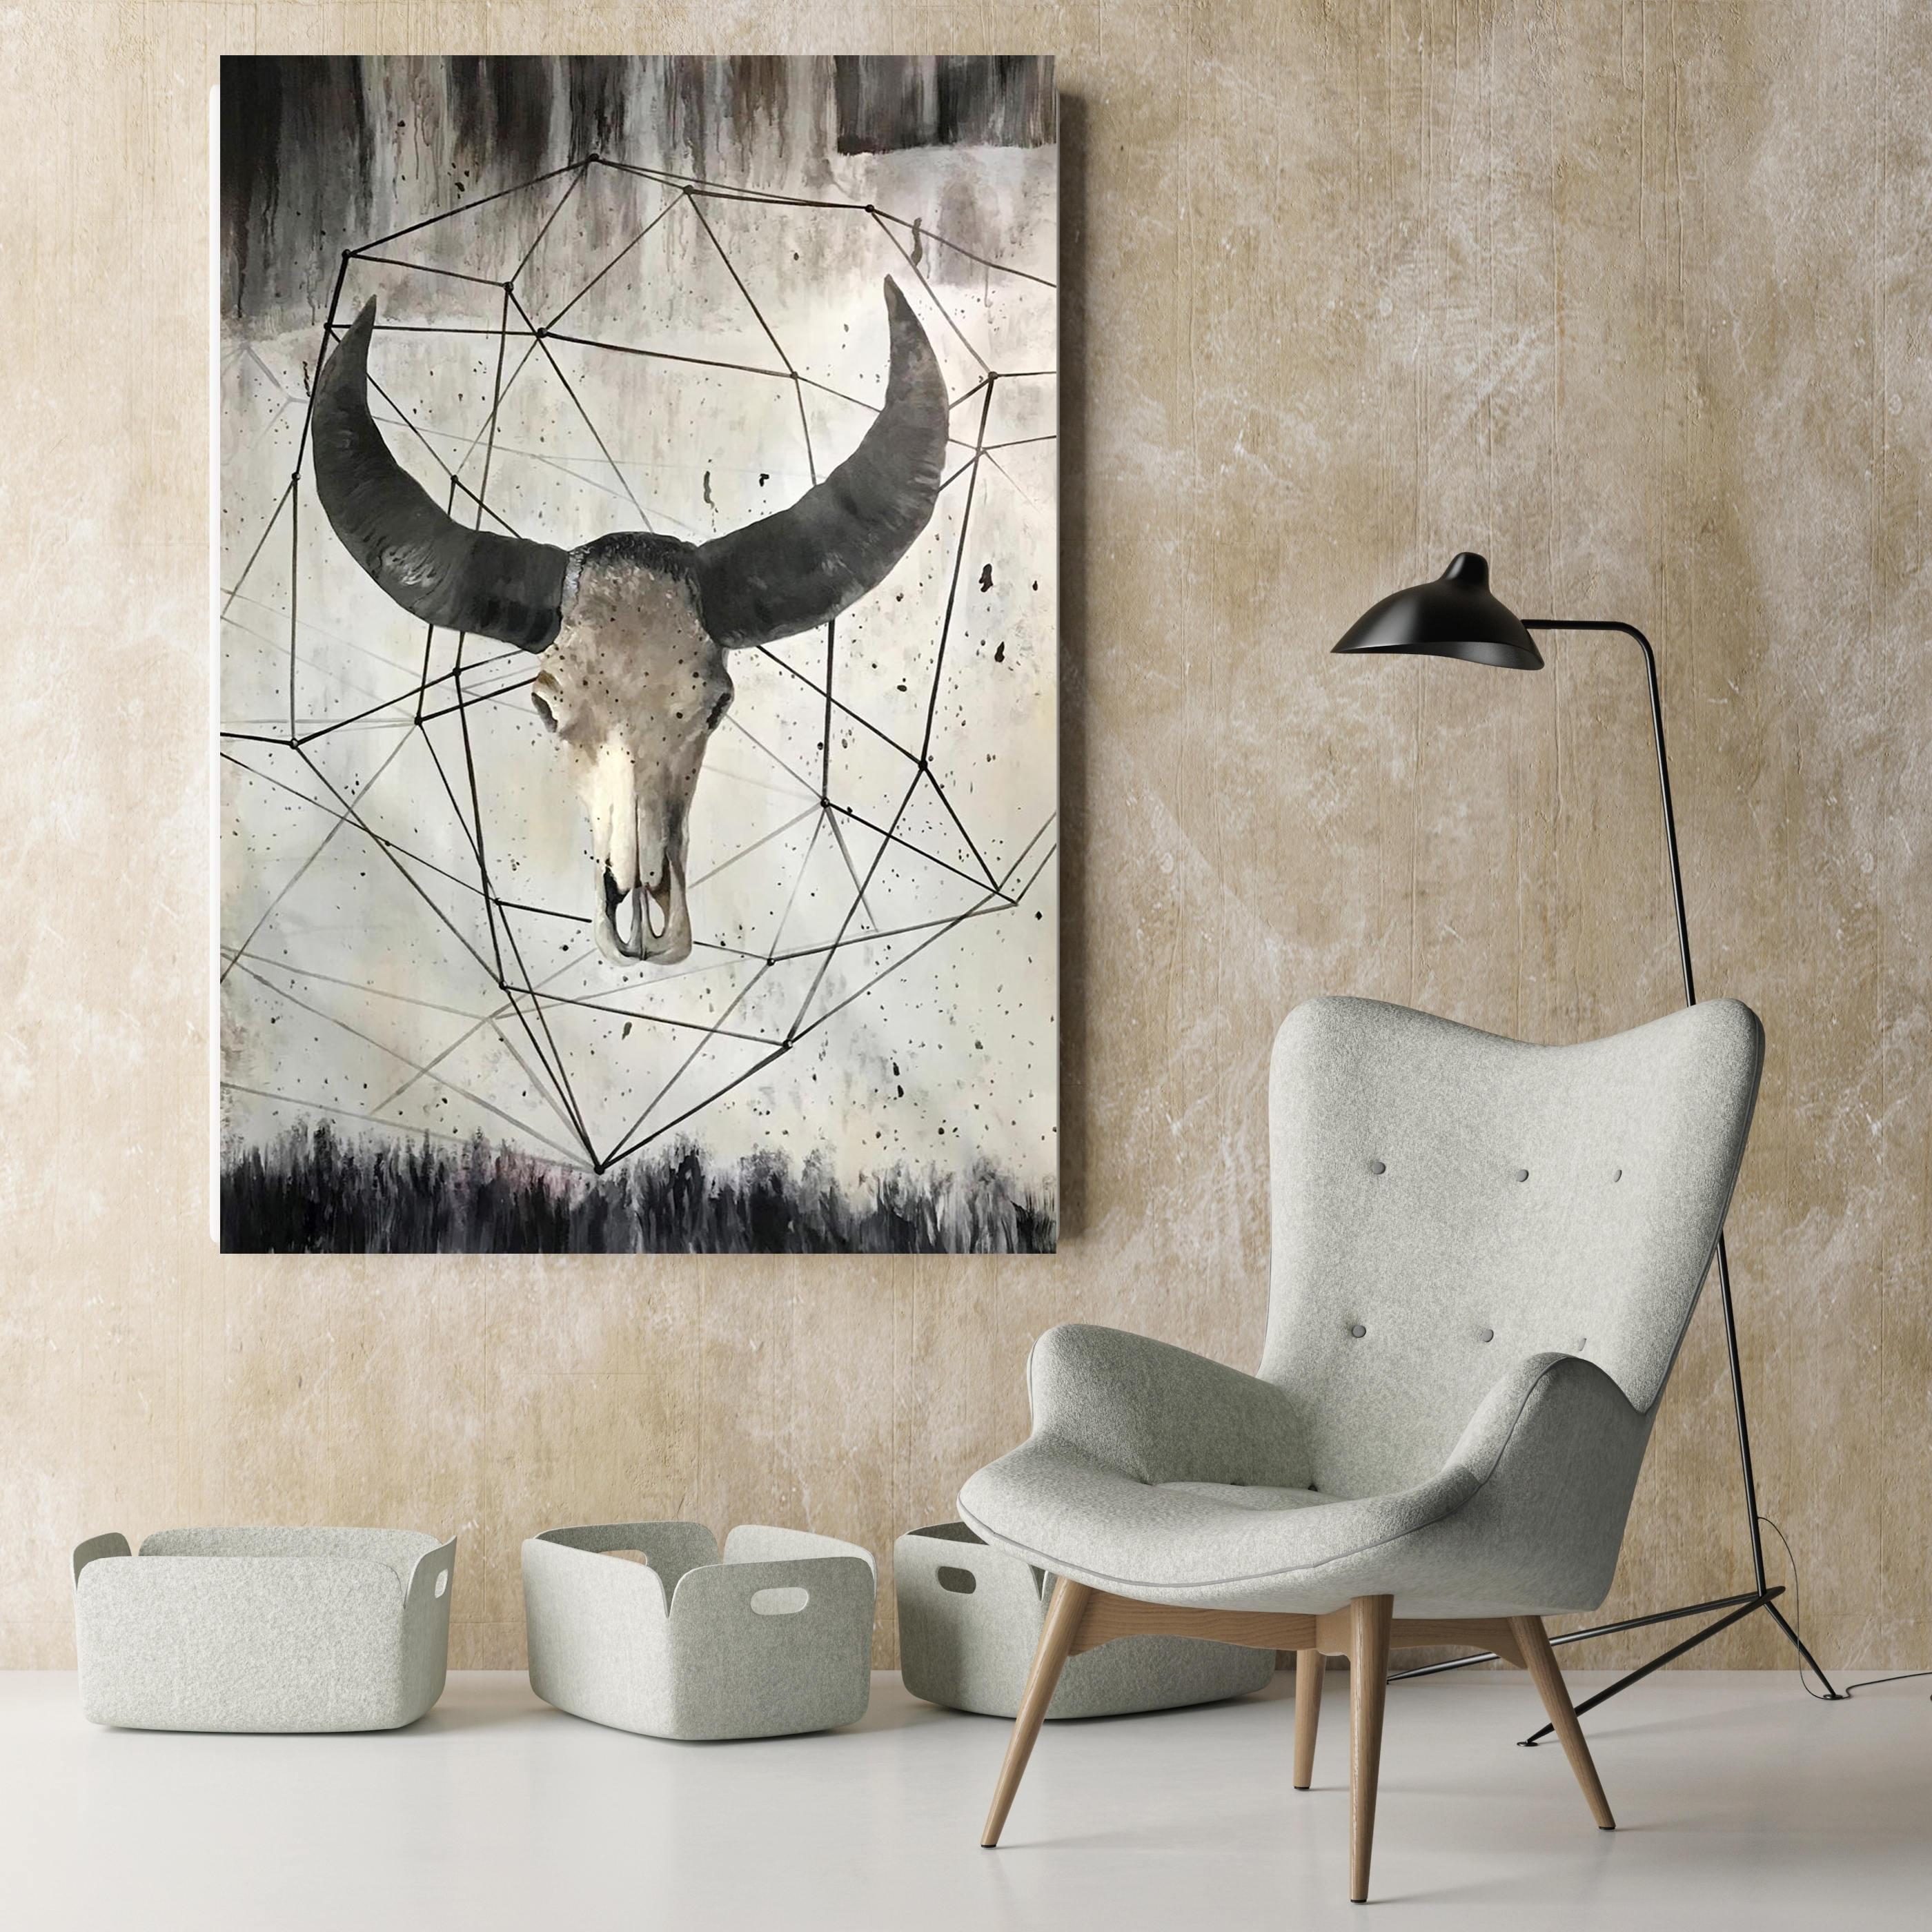 Orl-9981-12 Buffalo Skull 2. Extra Large Rustic Buffalo Skull pertaining to Latest Rustic Canvas Wall Art